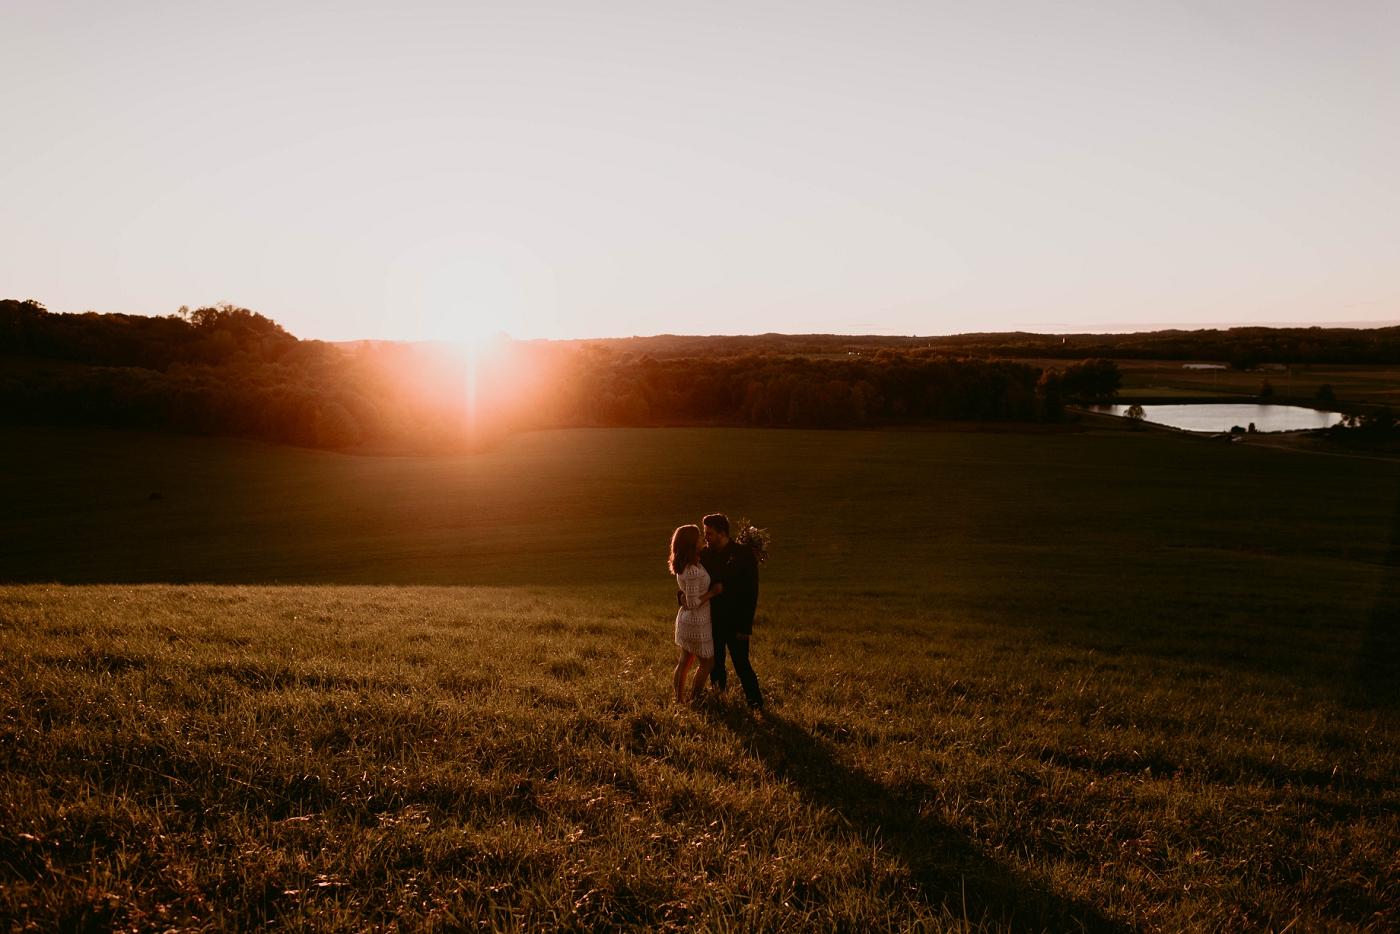 Wildflower-Field-Elopement-Vow-Renewal_Lisa+Chad_MJPHOTO-248.JPG